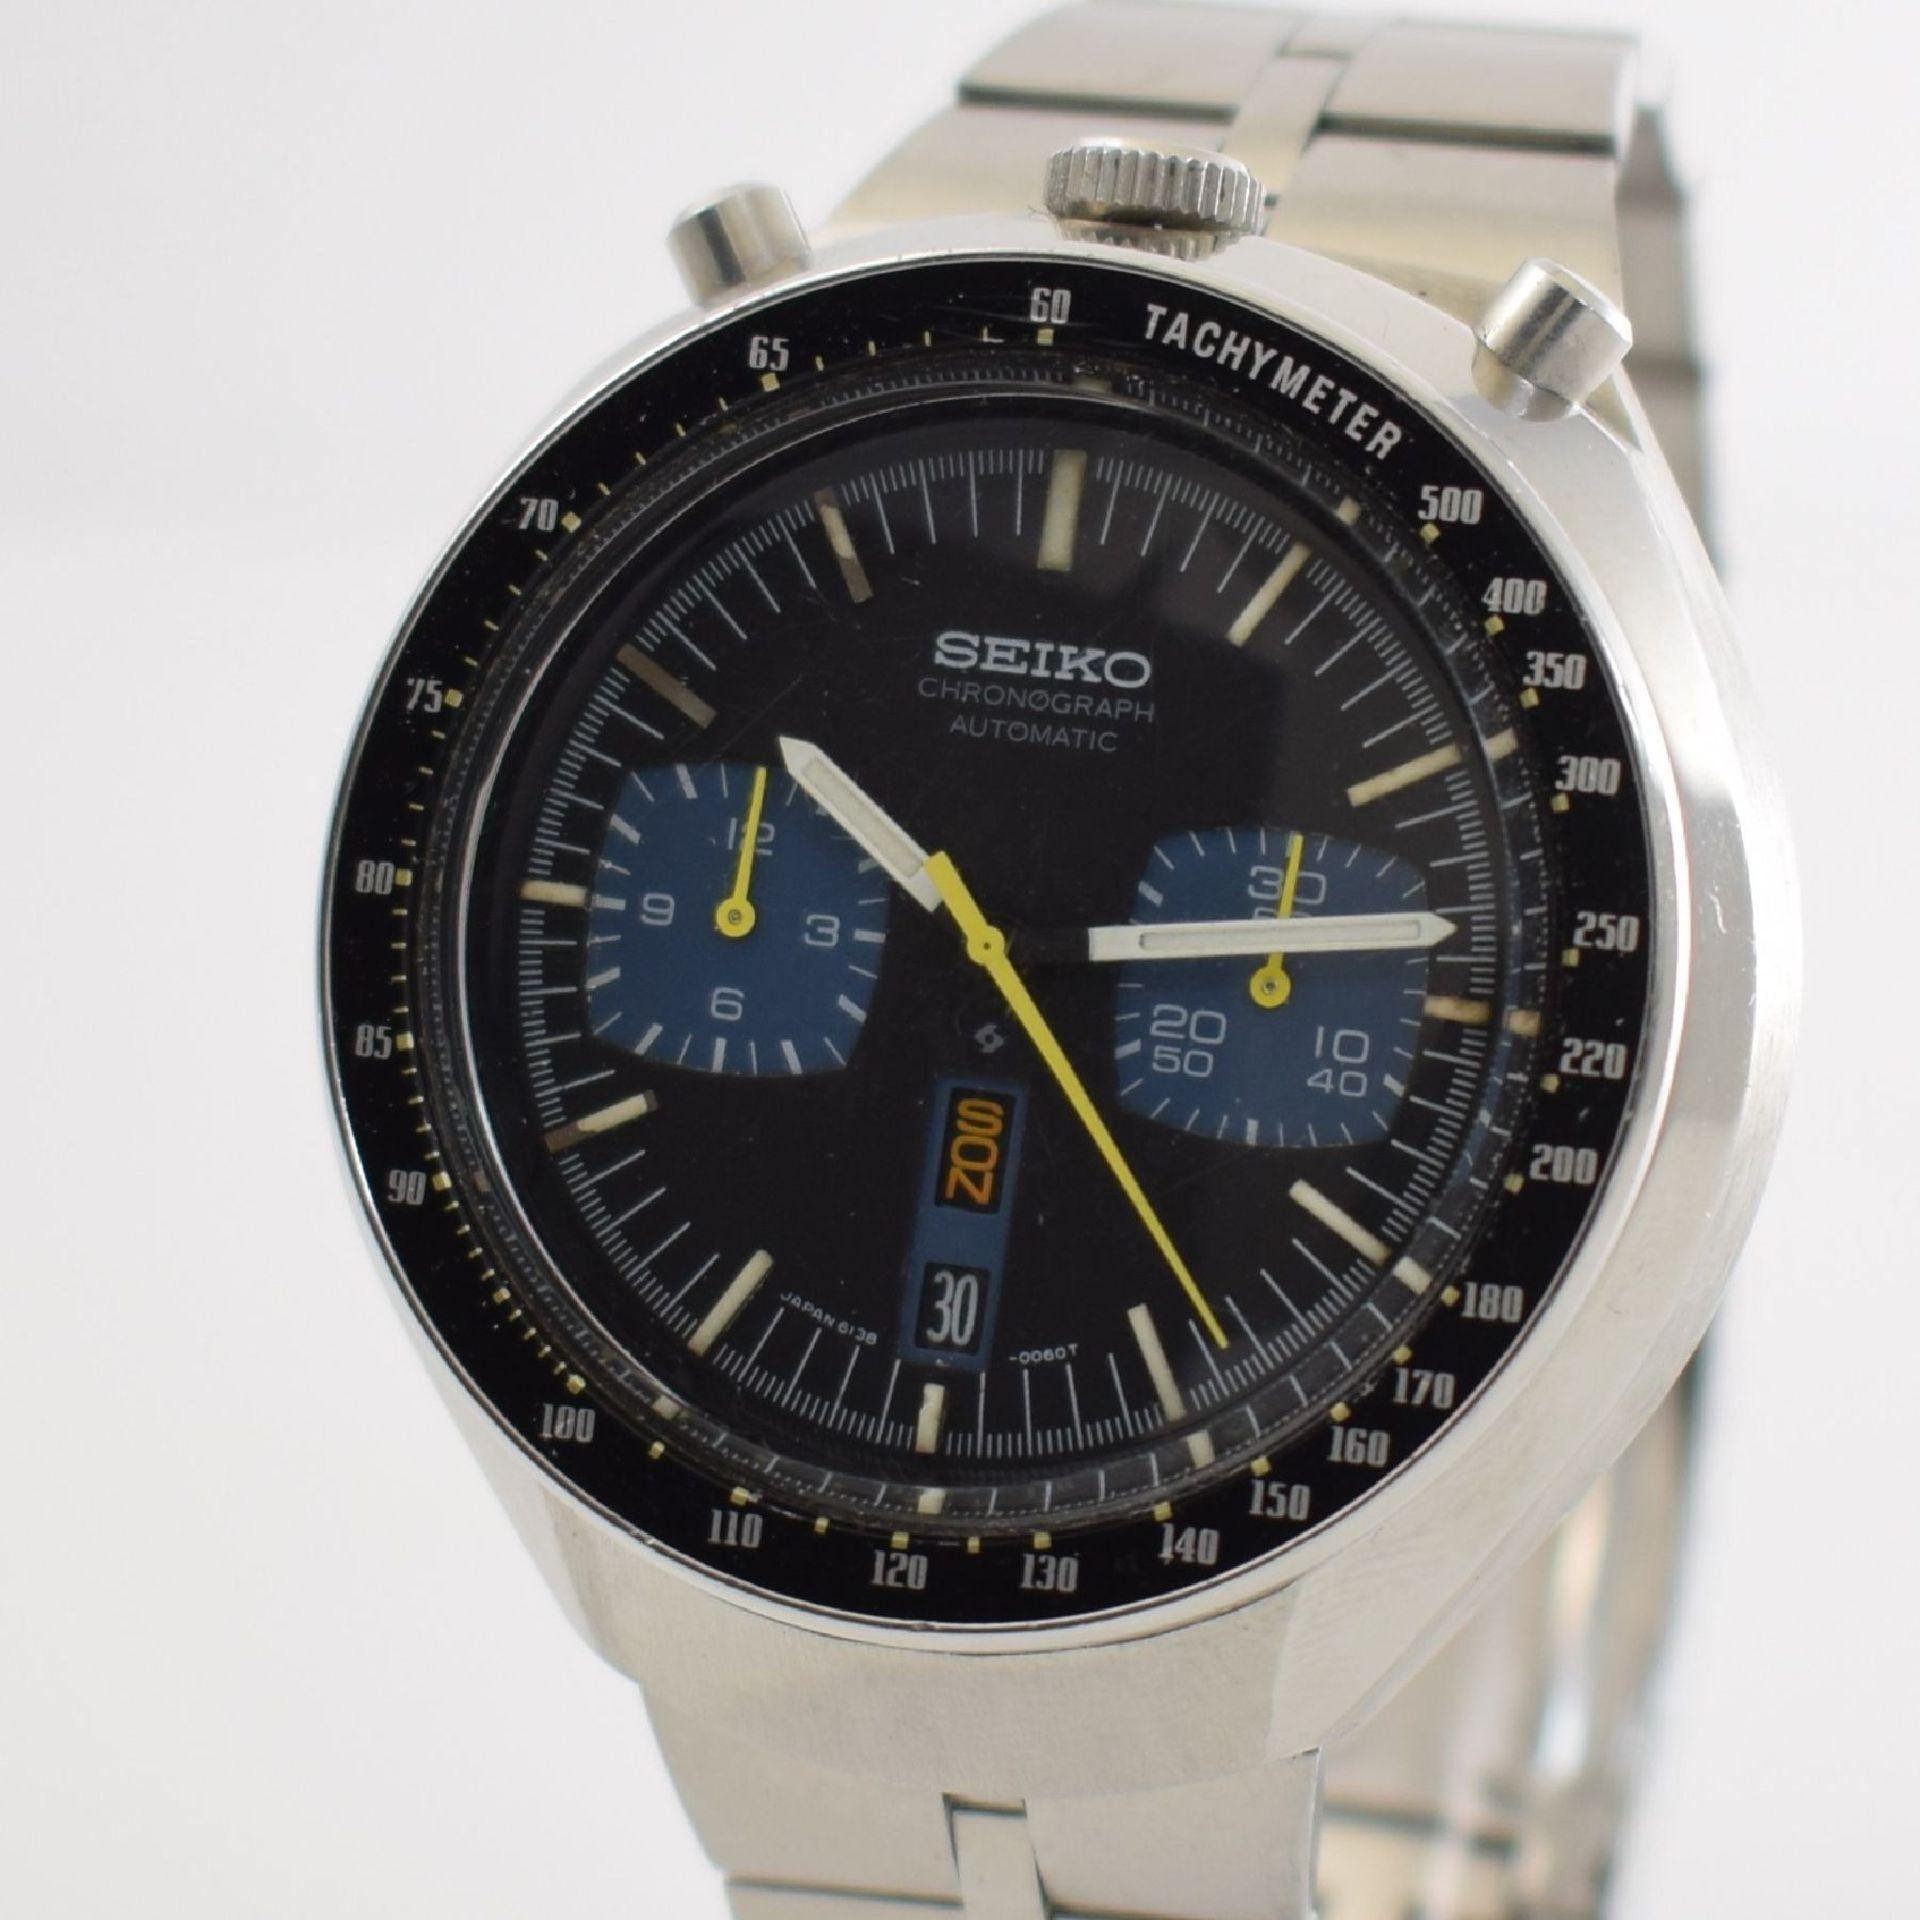 SEIKO sog. BULLHEAD Armbandchronograph, Japan um 1970, Automatik, Ref. 6138-0040, verschr. - Bild 4 aus 7